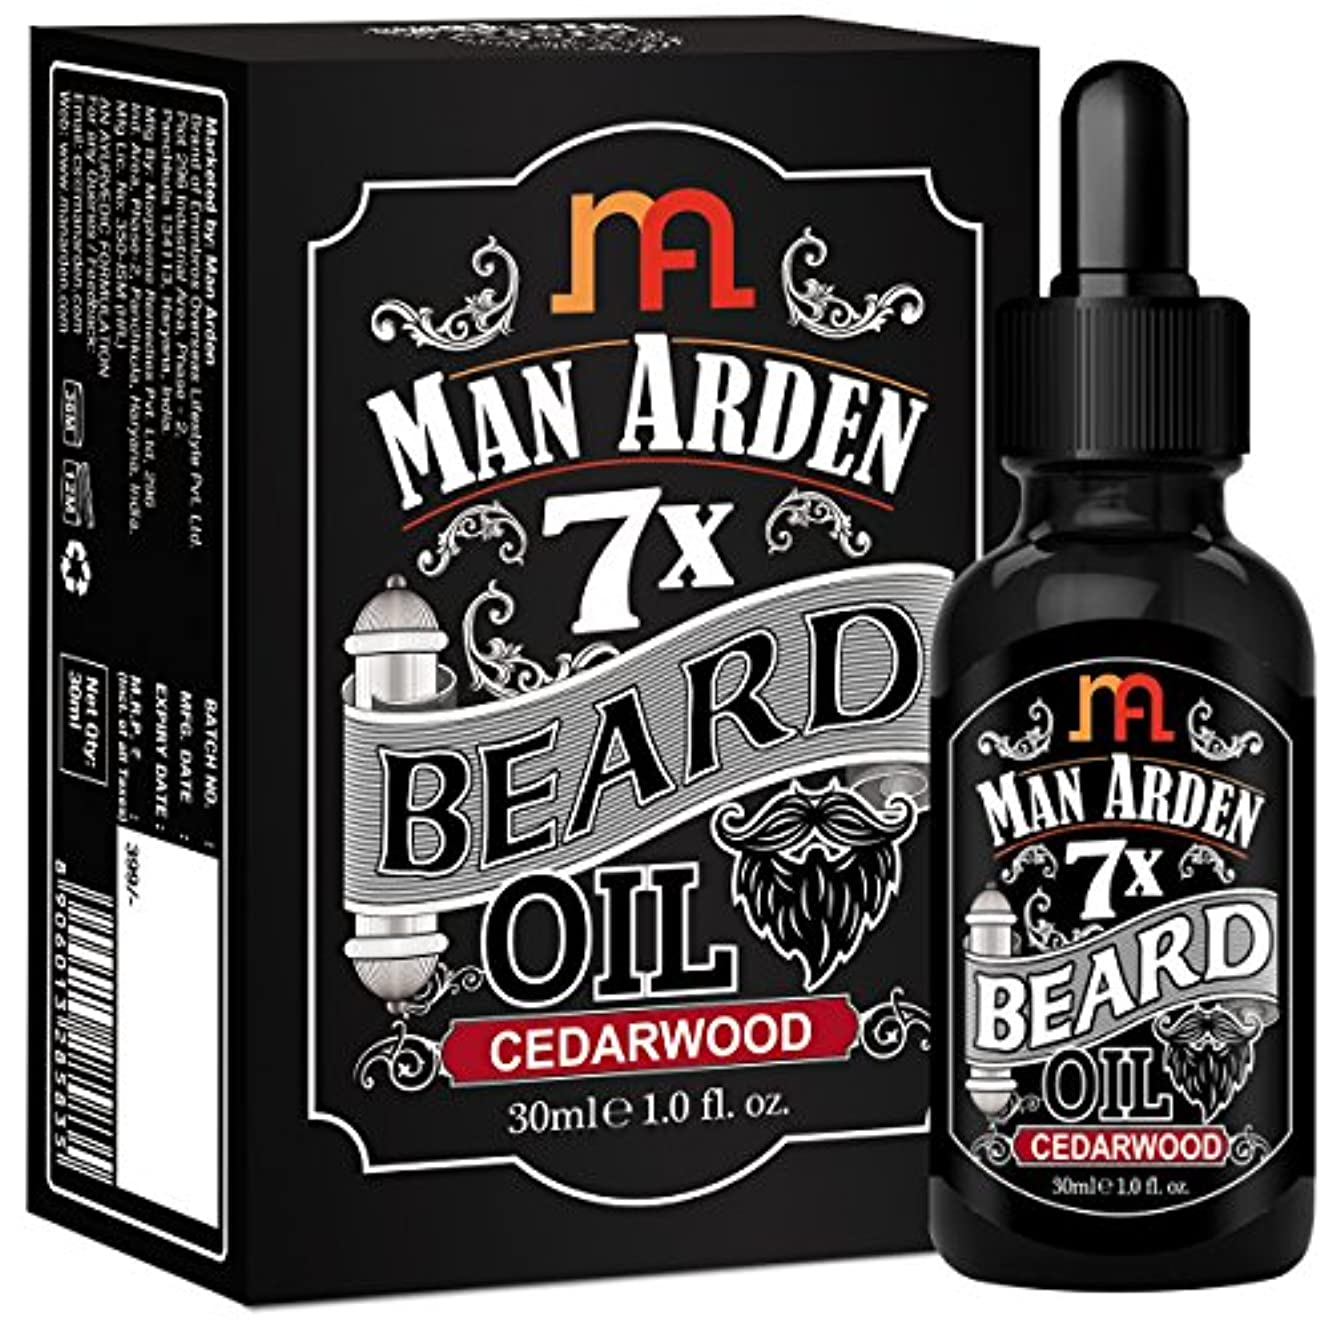 Man Arden 7X Beard Oil 30ml (Cedarwood) - 7 Premium Oils Blend For Beard Growth & Nourishment